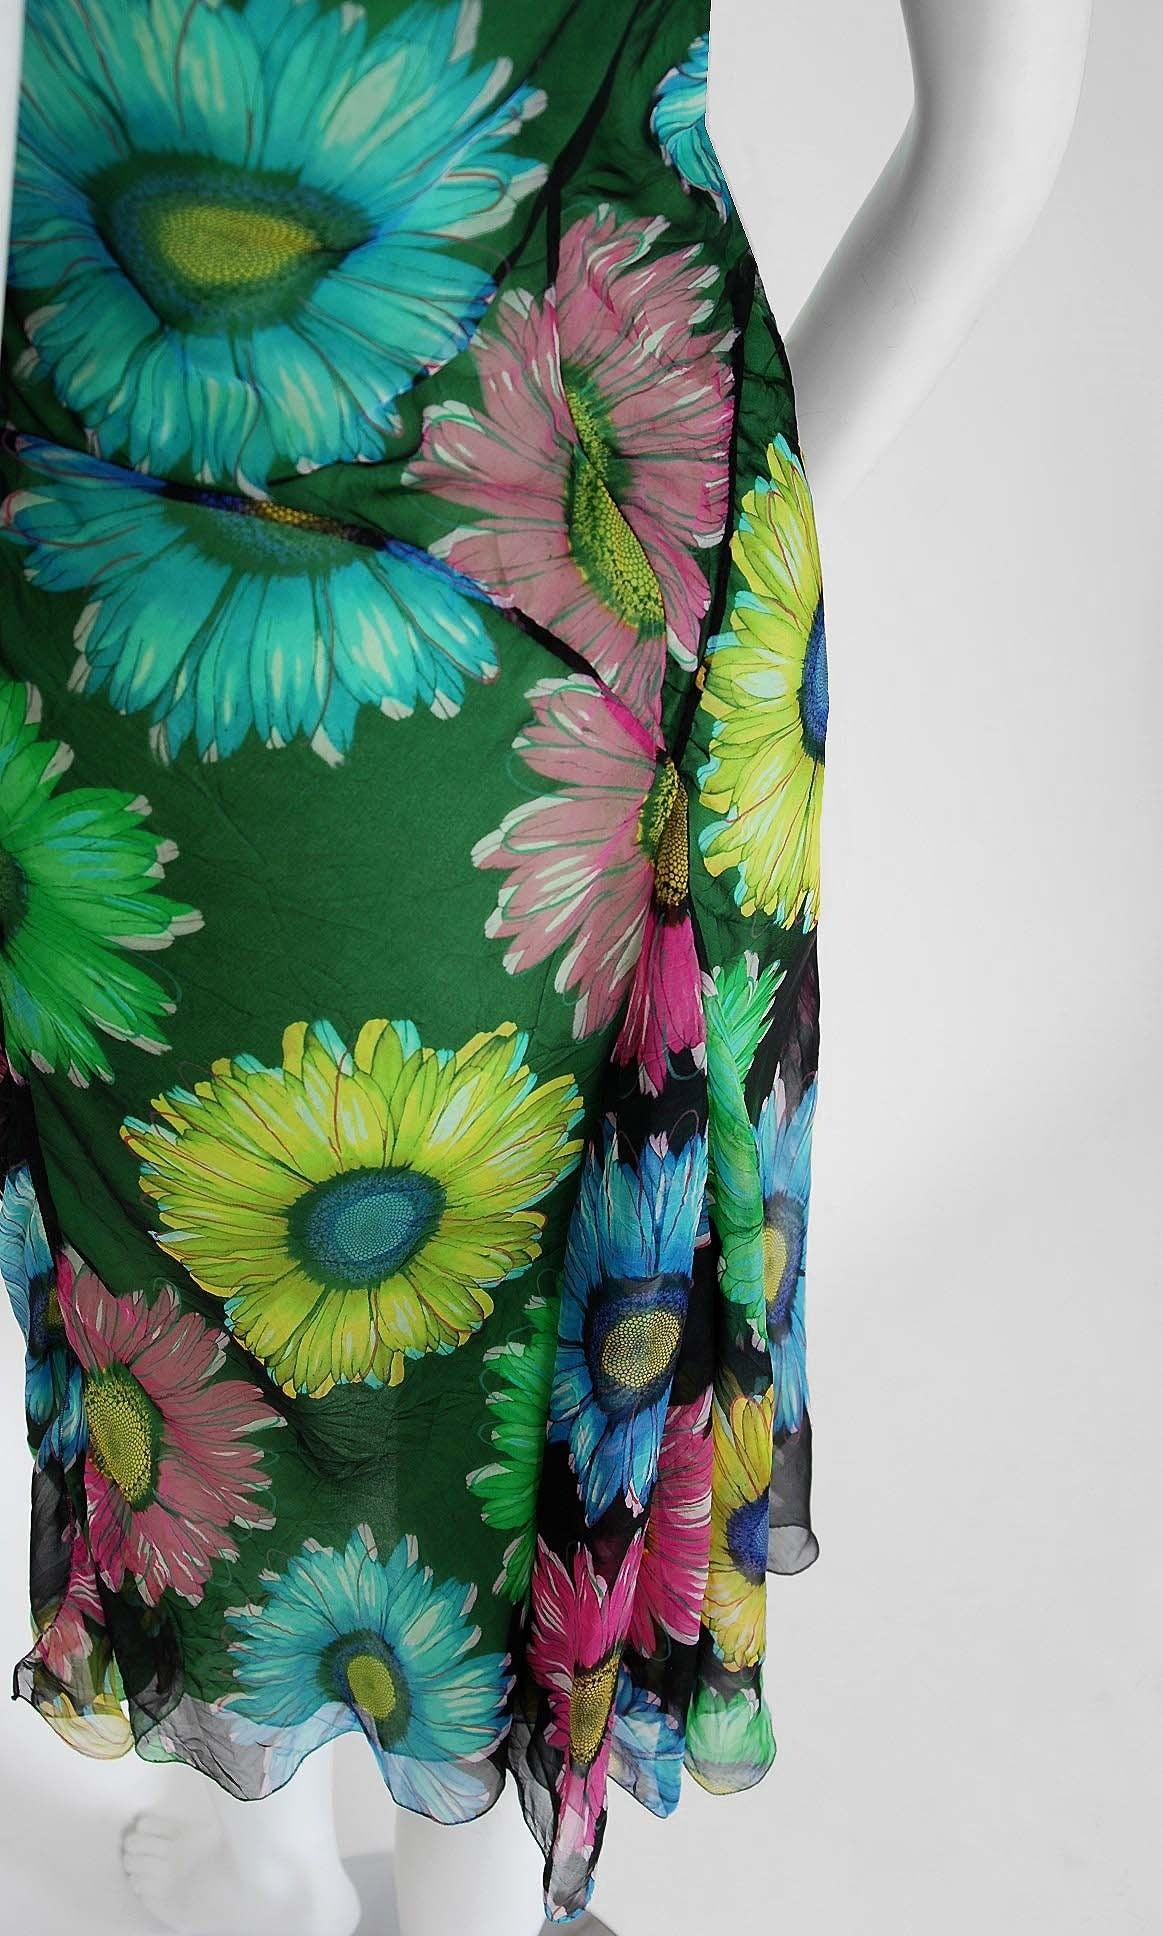 Women's 1990's Gianni Versace Couture Sunflower Floral Chiffon Bias-Cut Fishtail Dress For Sale